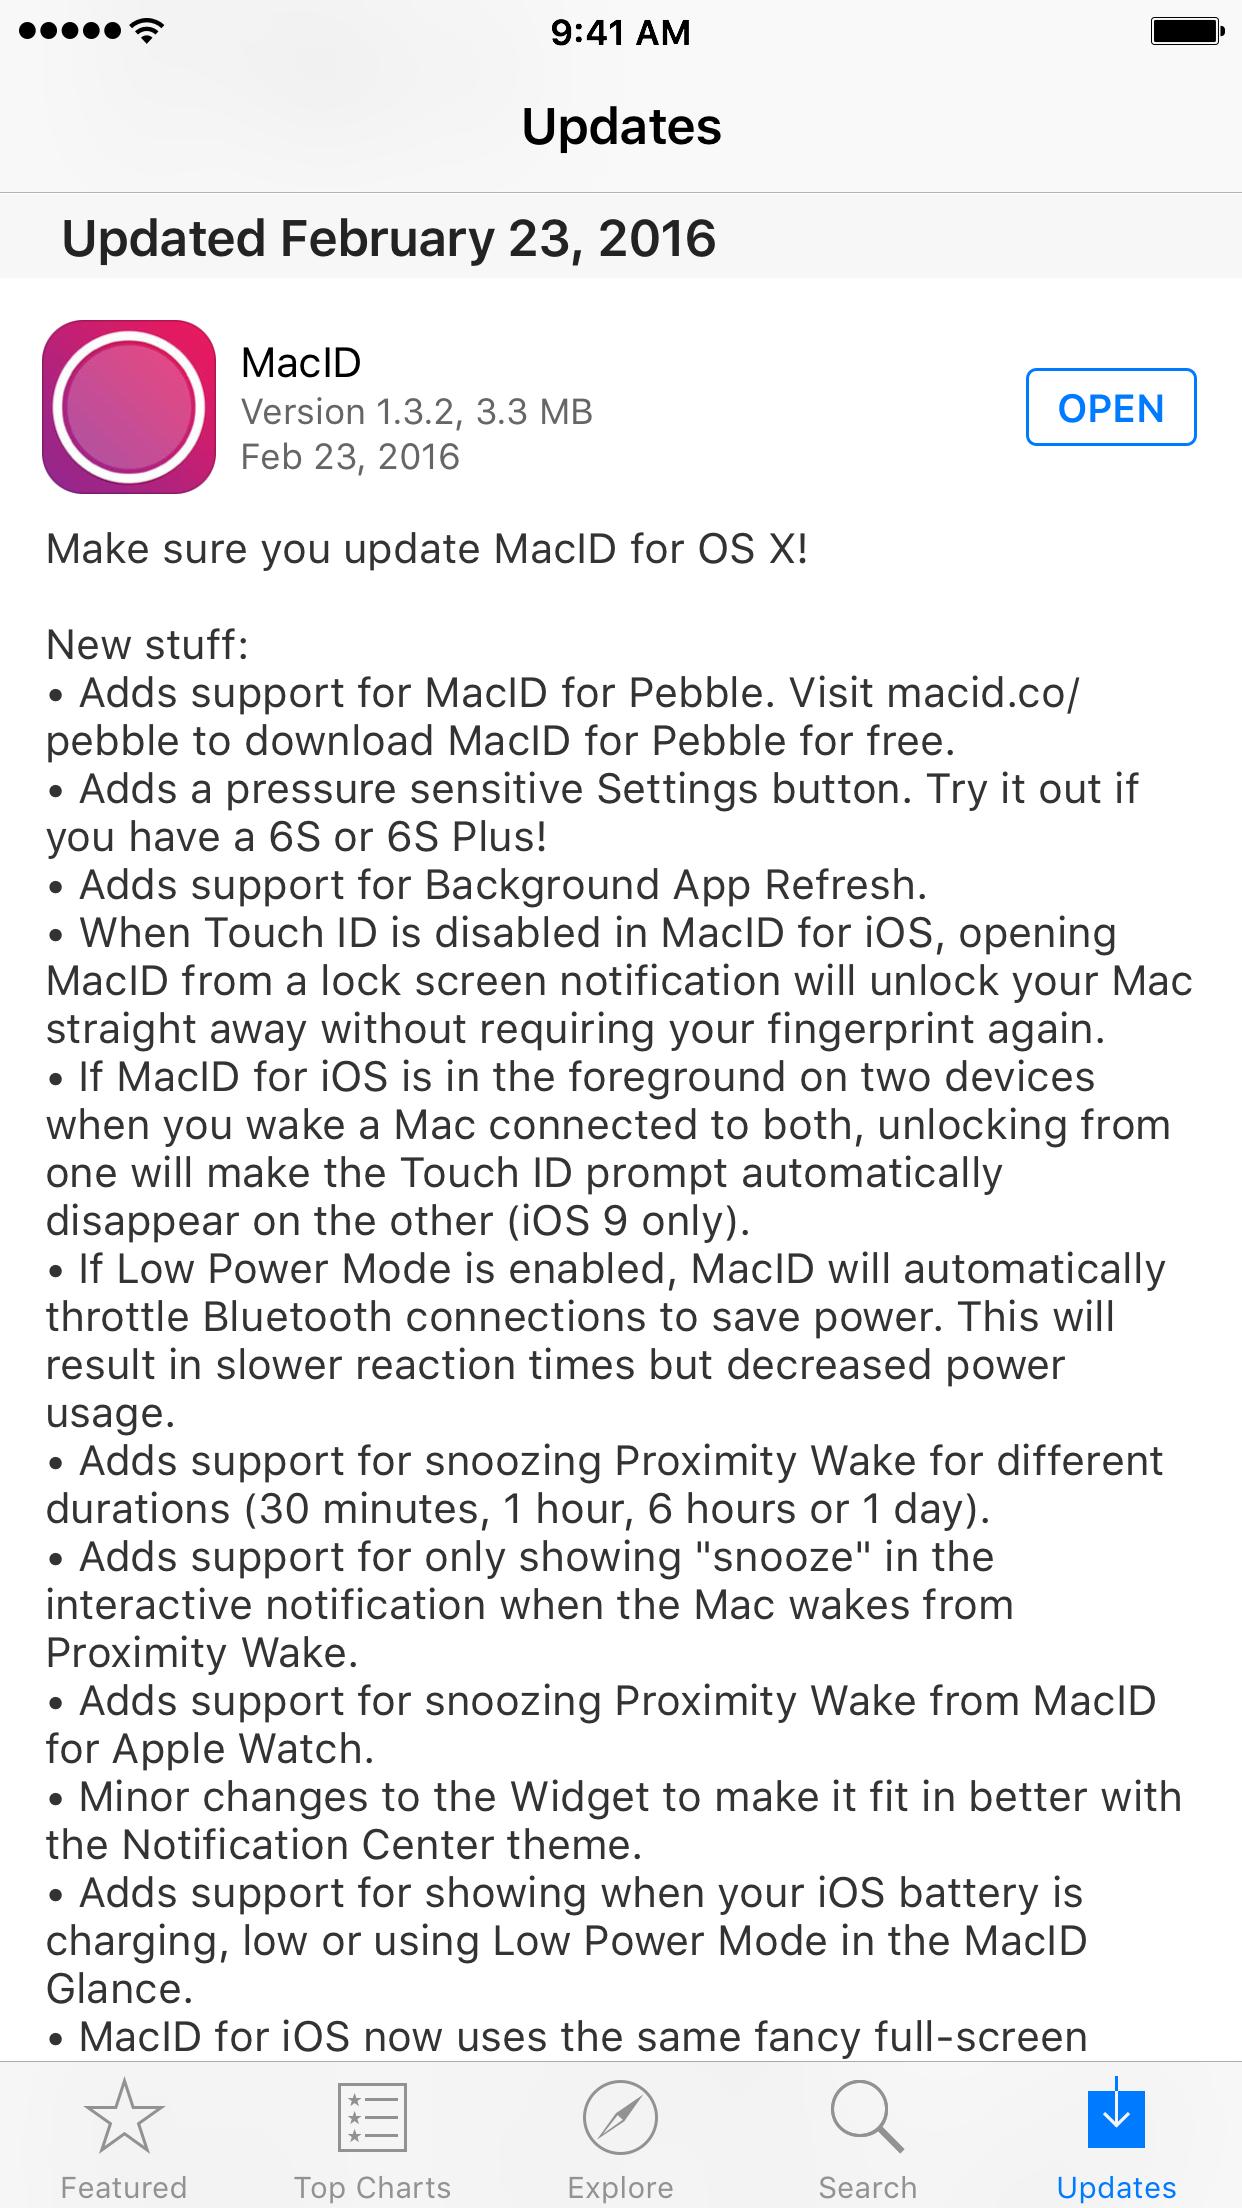 MacID 1.3.2 for iOS App Store Update